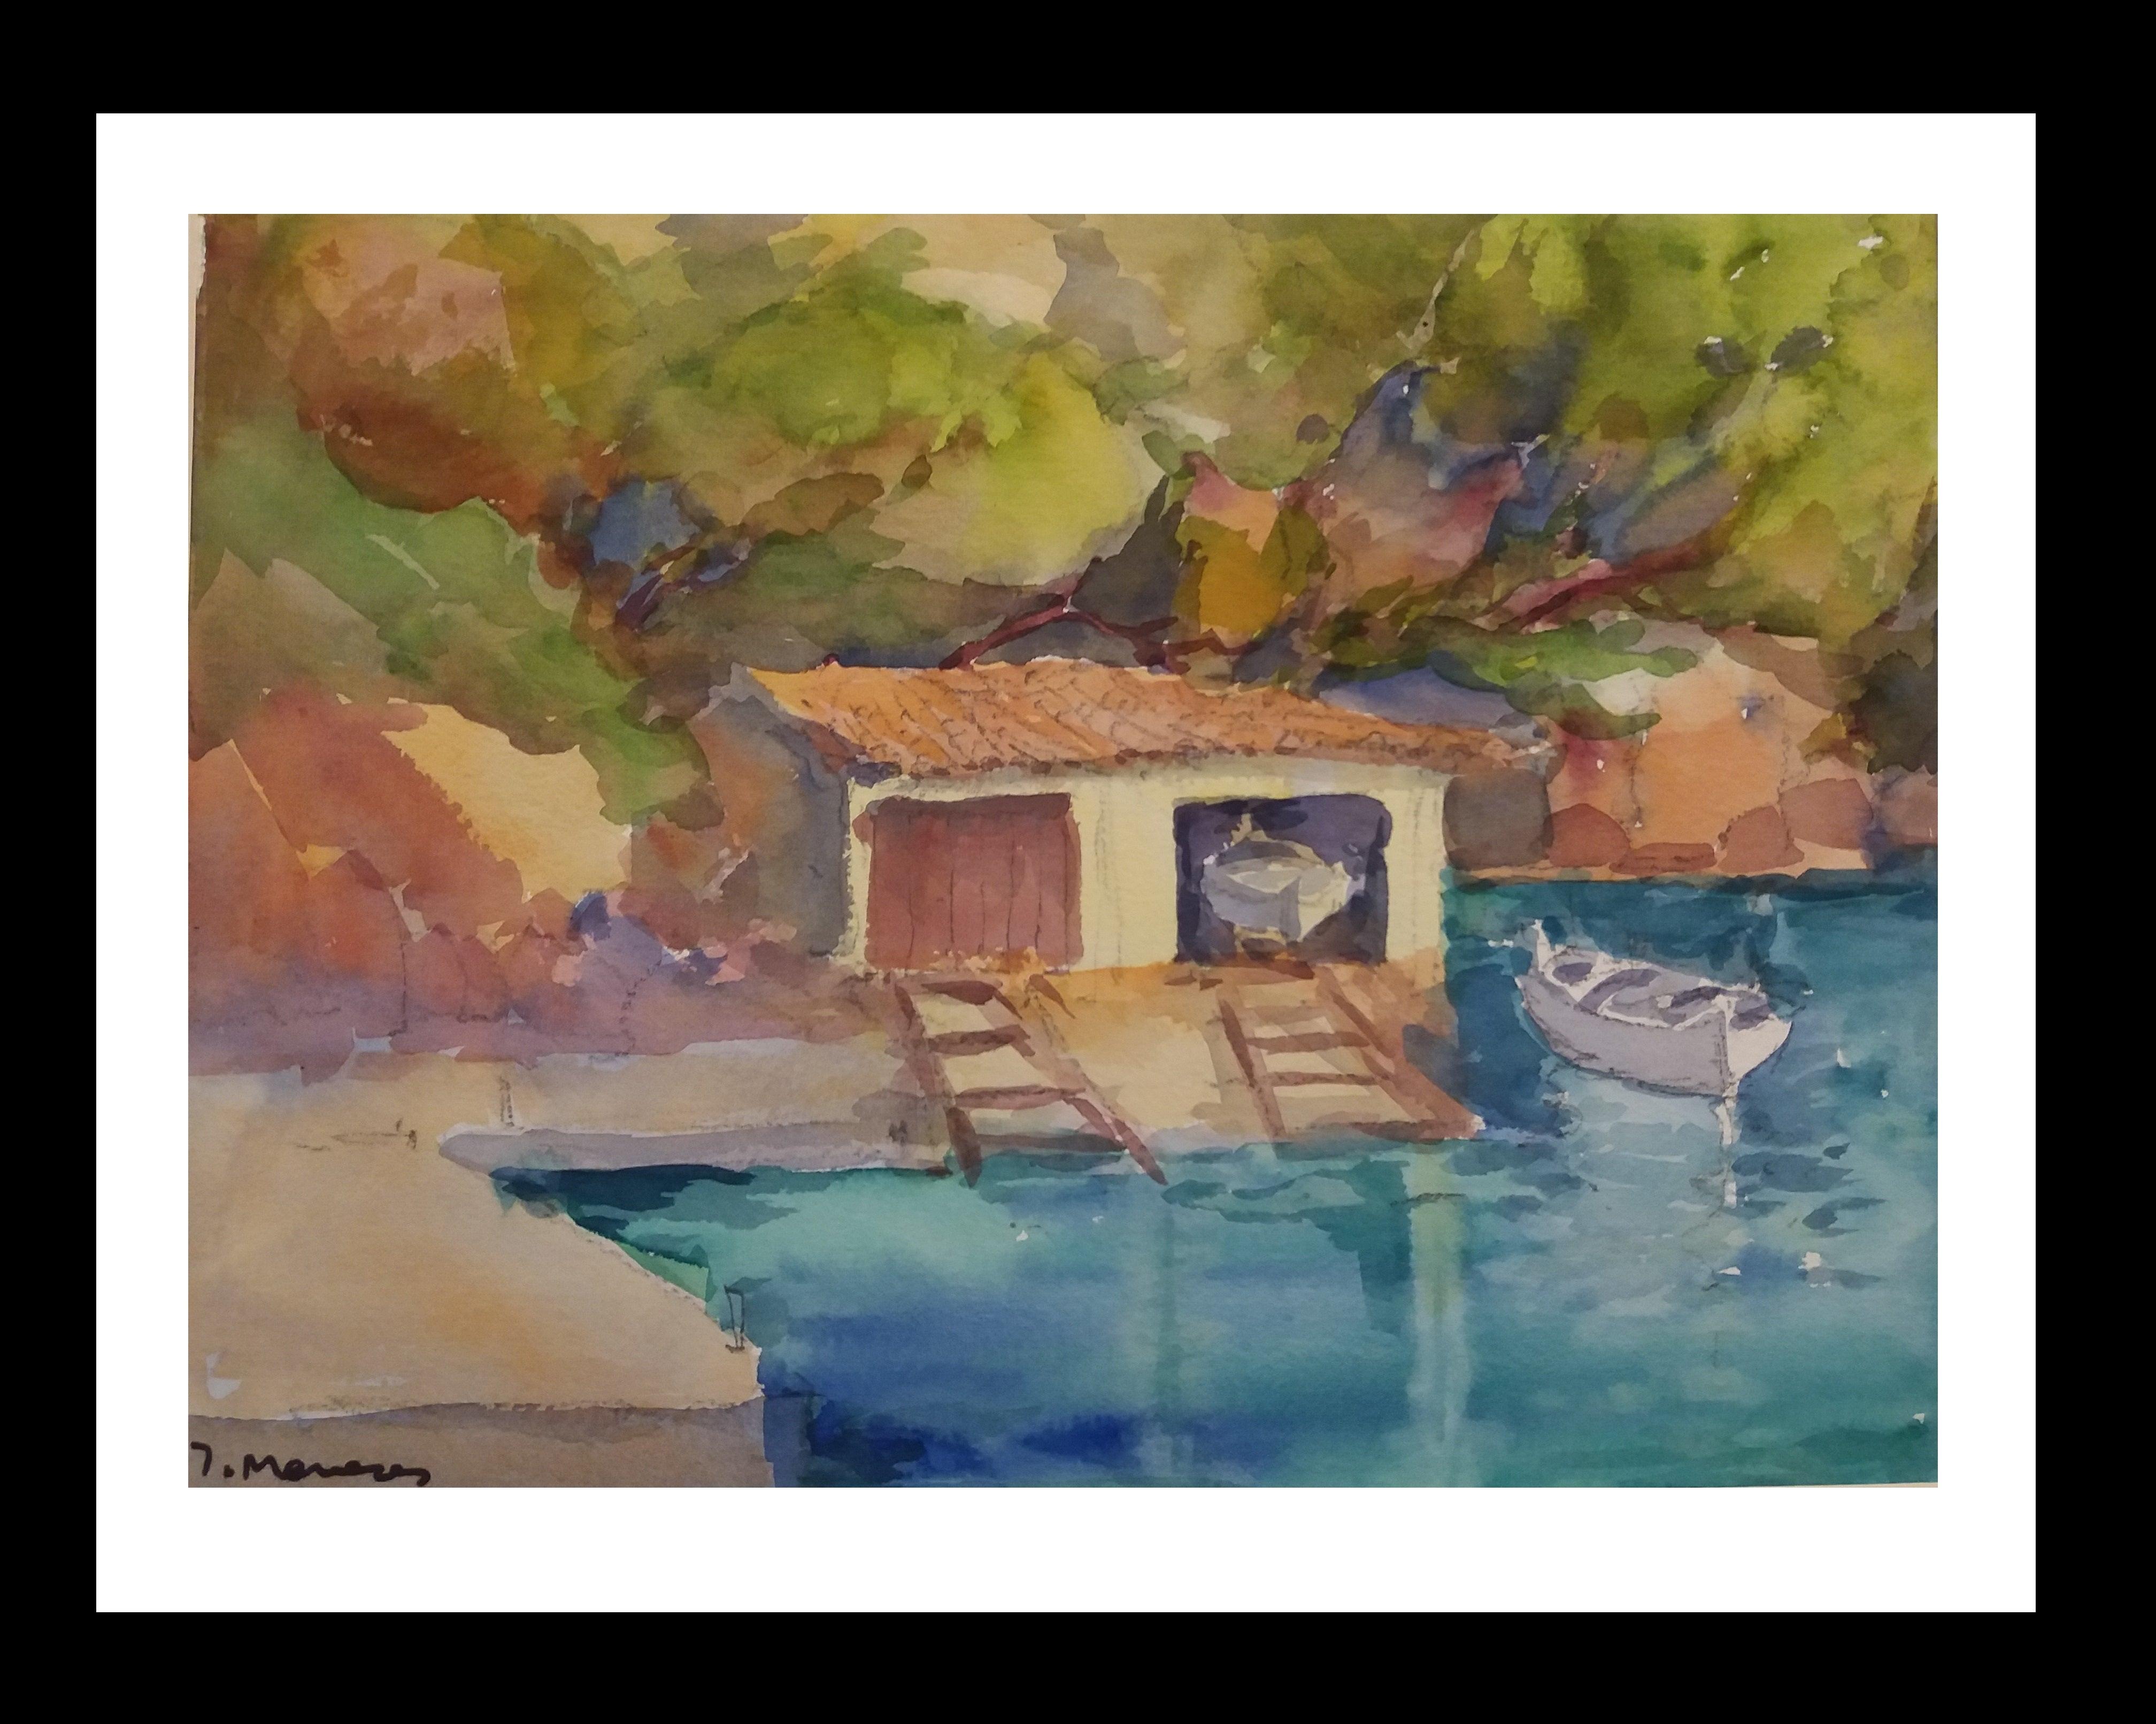 Majorca original watercolor papel impressionist painting